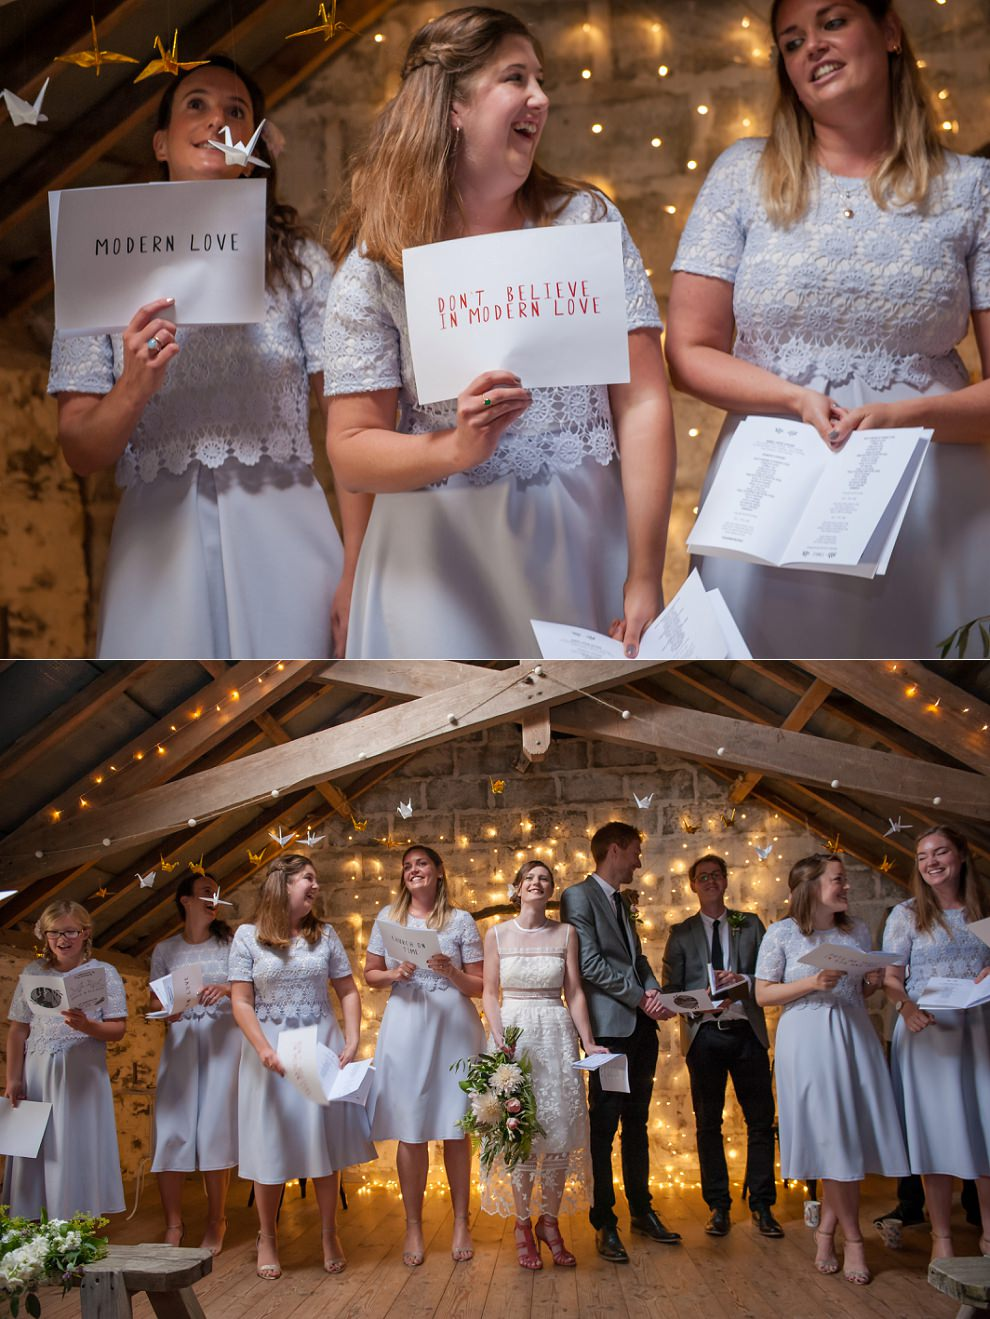 Wedding singalong